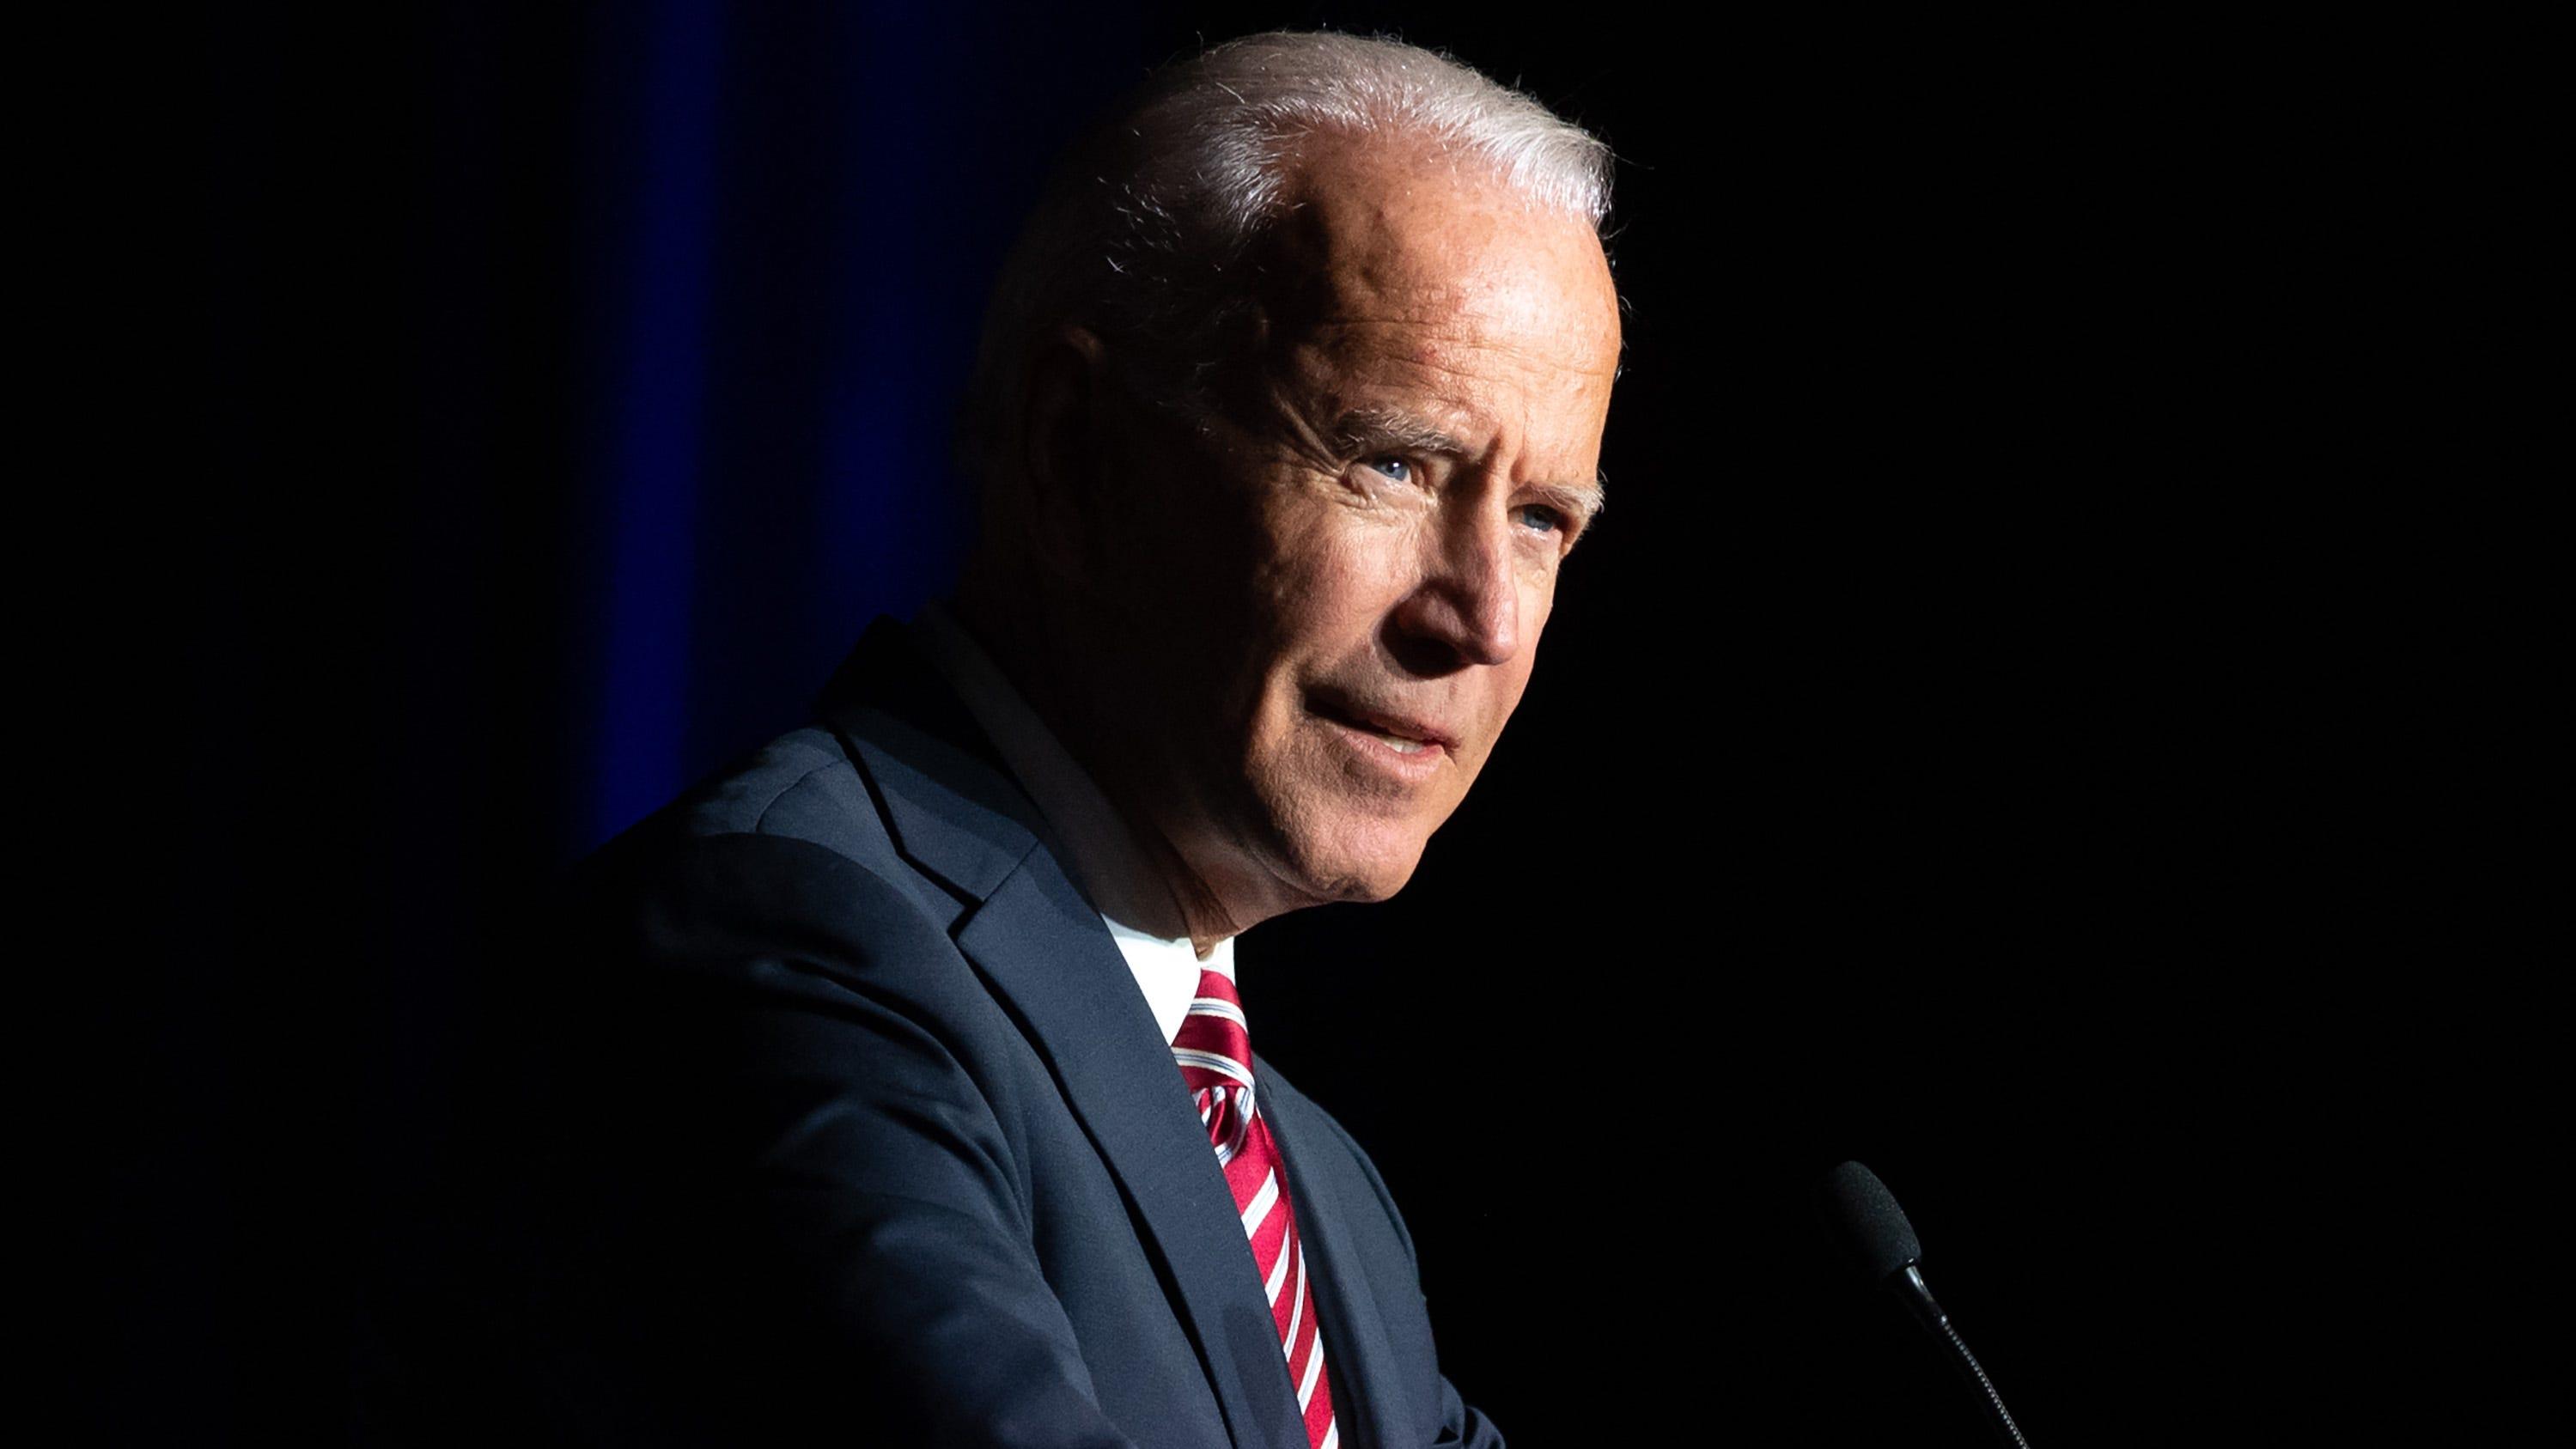 Former Vice President Joe Biden